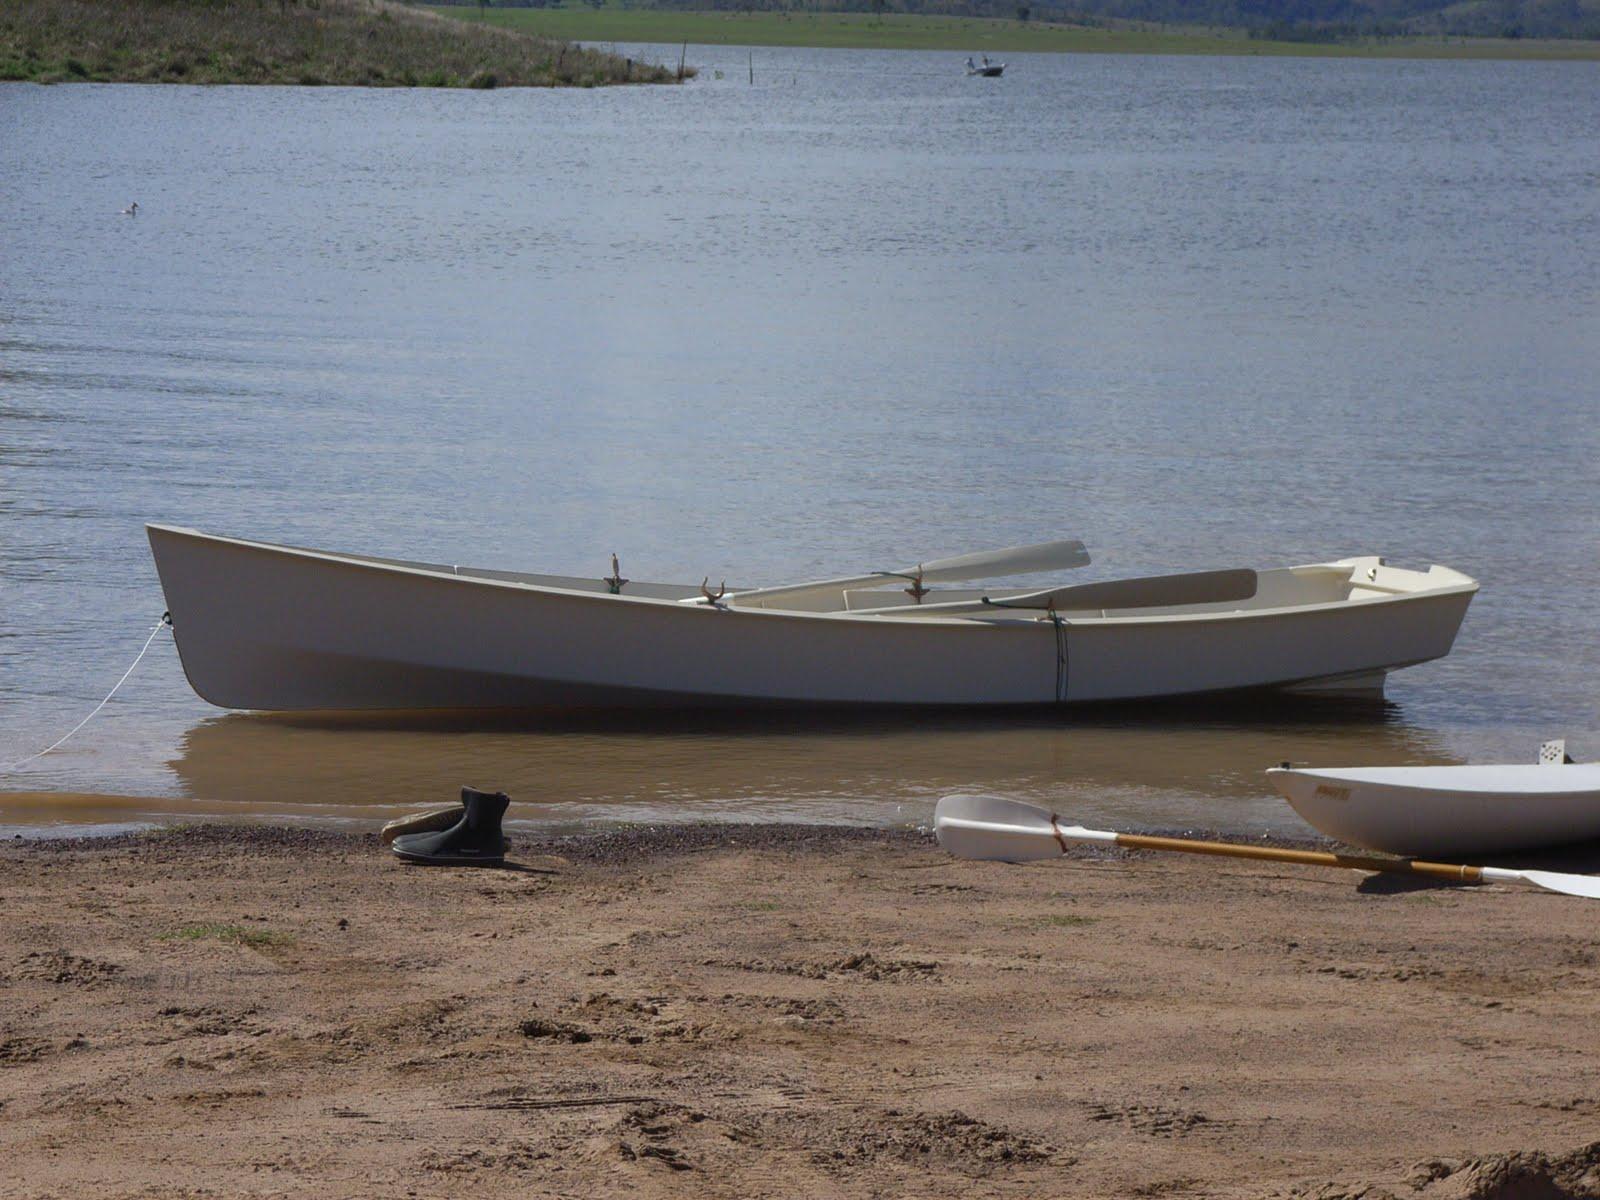 Ross Lillistone Wooden Boats: Fleet - a Planing-Hull ...